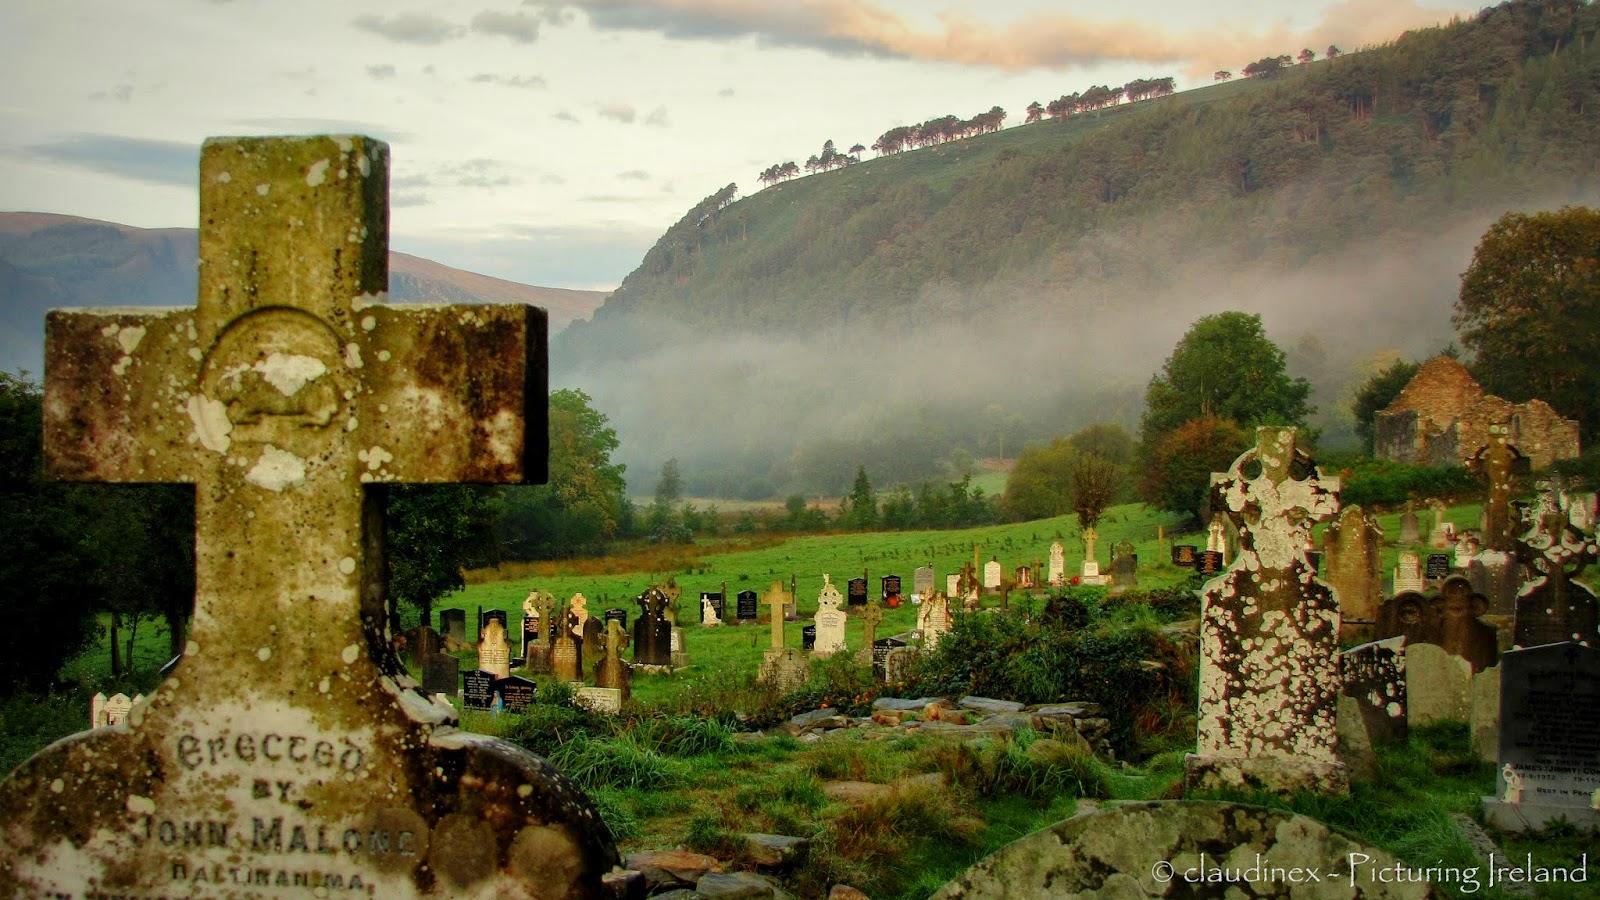 Best 54 Glendalough Wallpaper on HipWallpaper Glendalough 1600x900